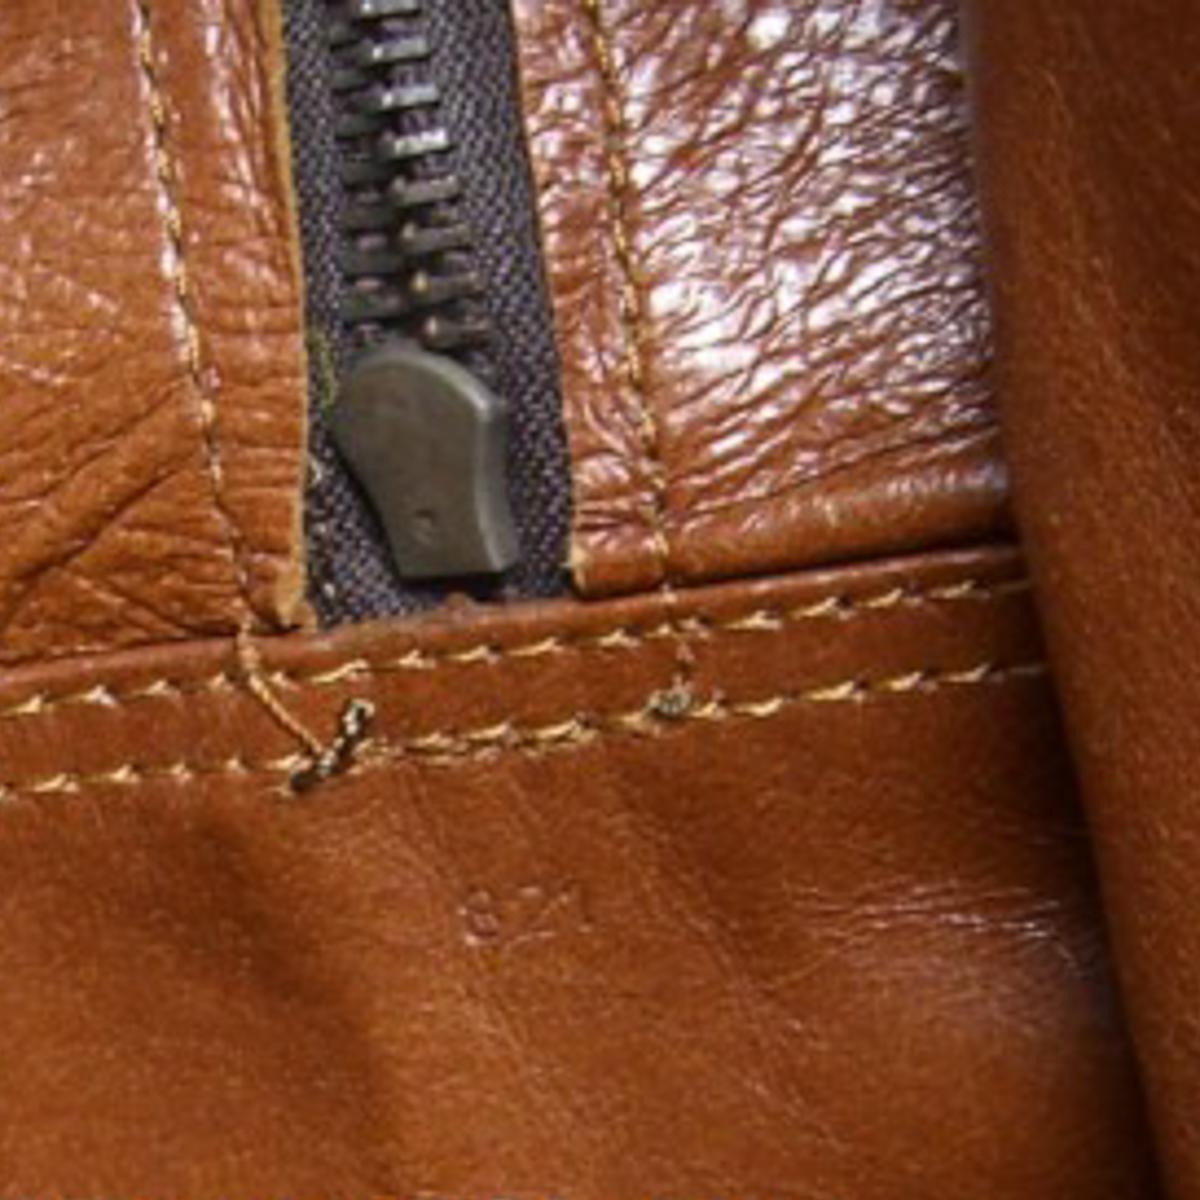 Louis Vuitton Date Code Interpretation - Lake Diary b762a5d286660